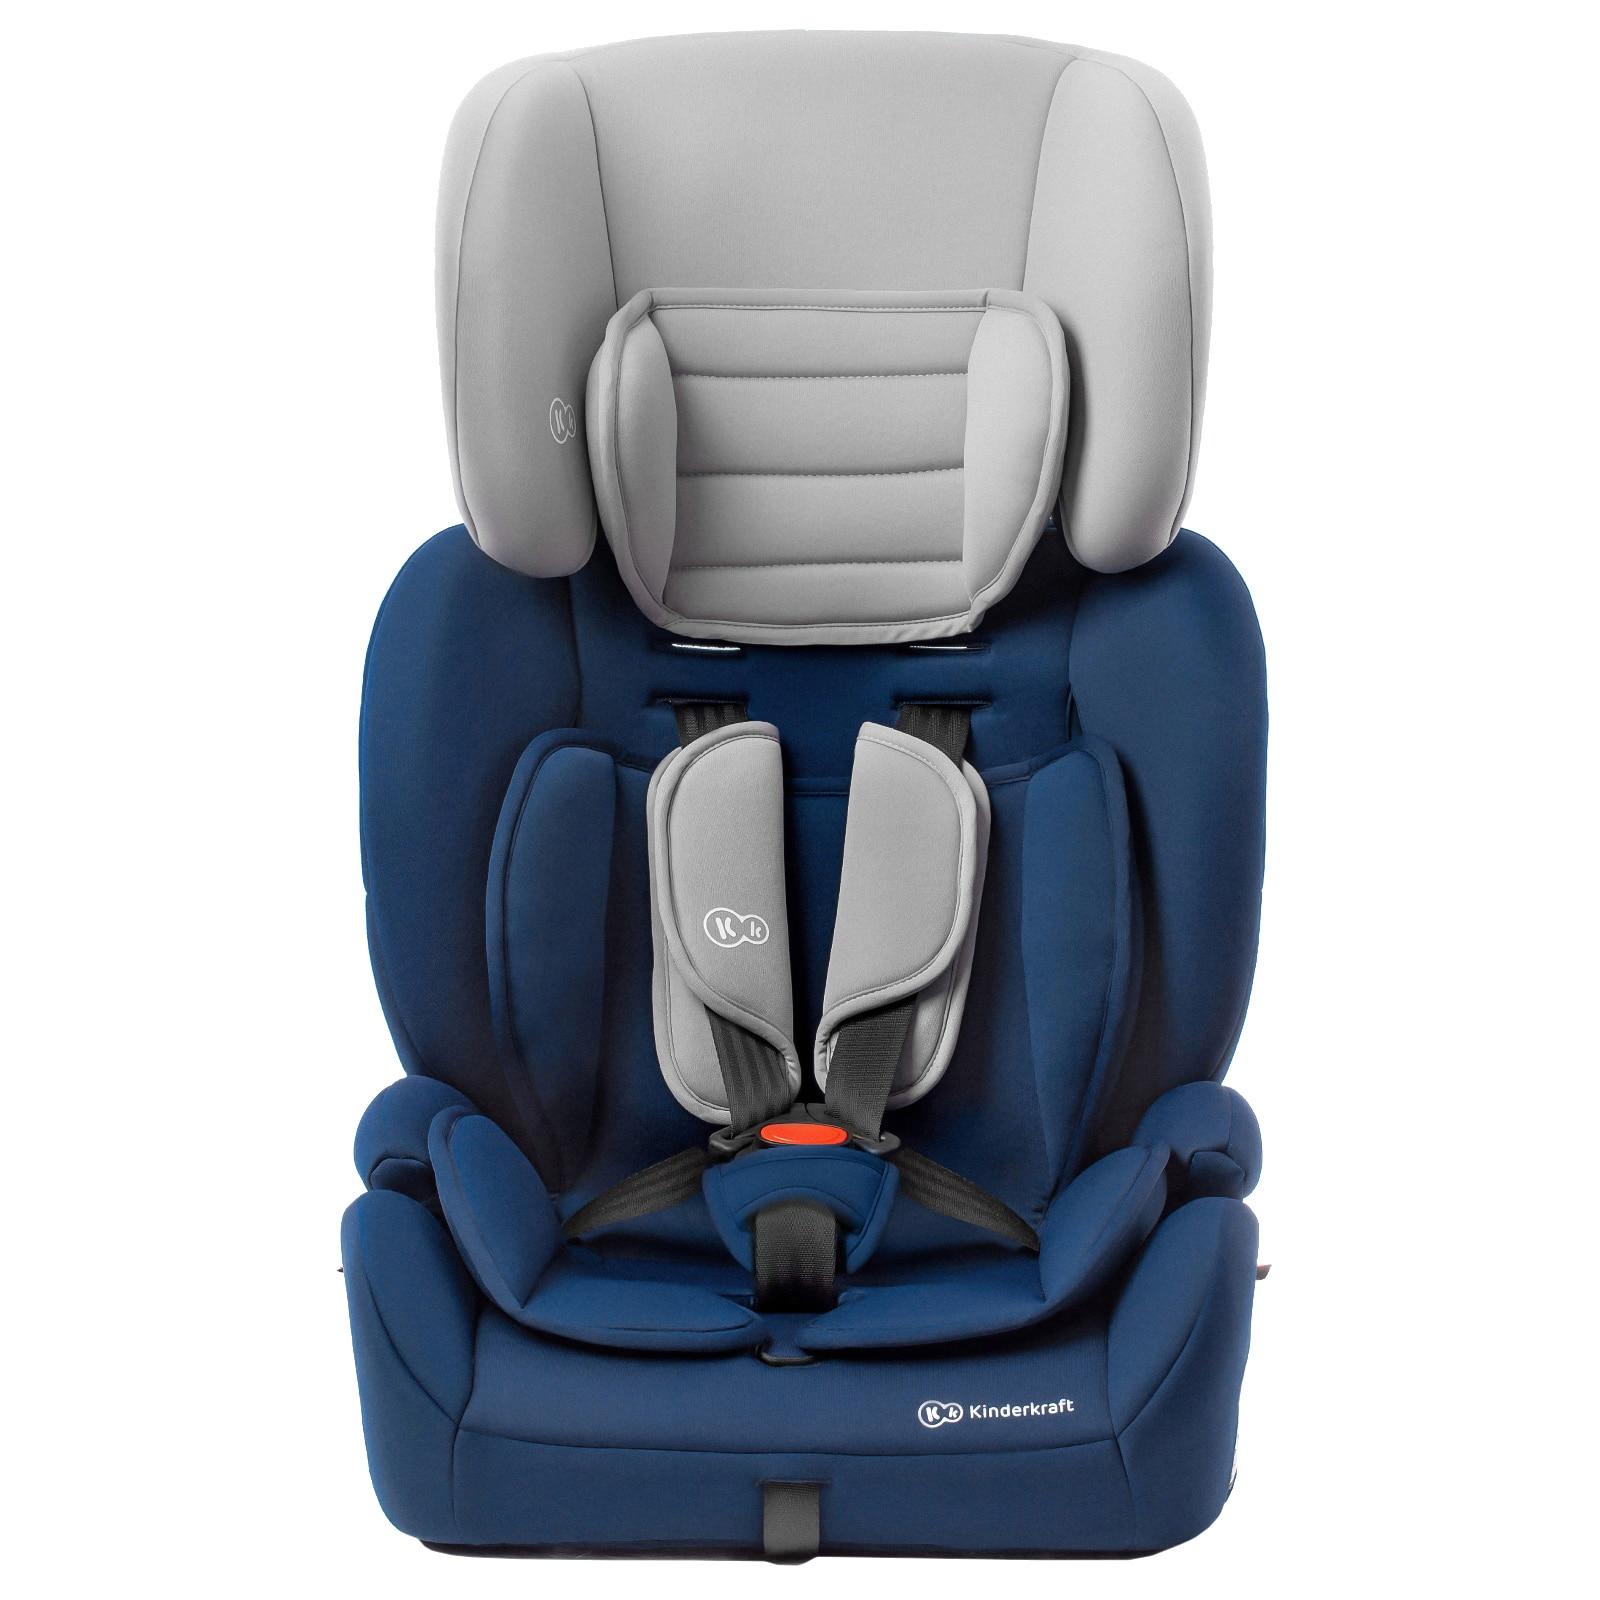 Fotografie Scaun auto Kinderkraft Concept, 9-36 kg, Albastru